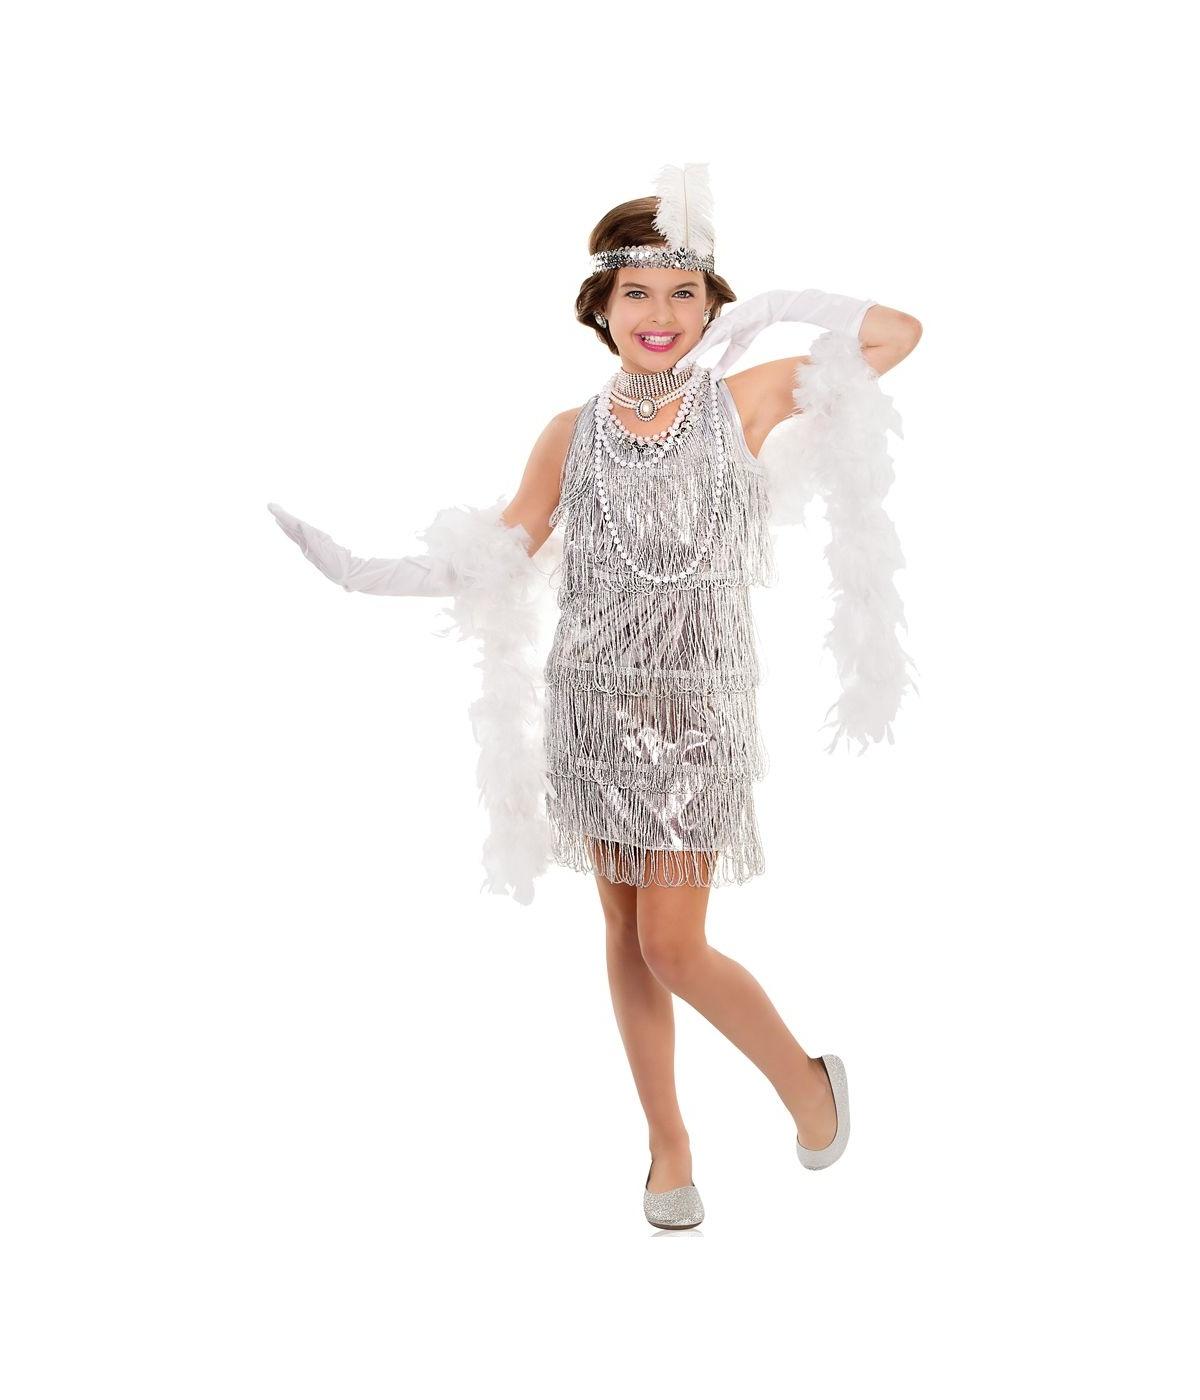 Girl costume dazzling silver flapper girls 1920s costume